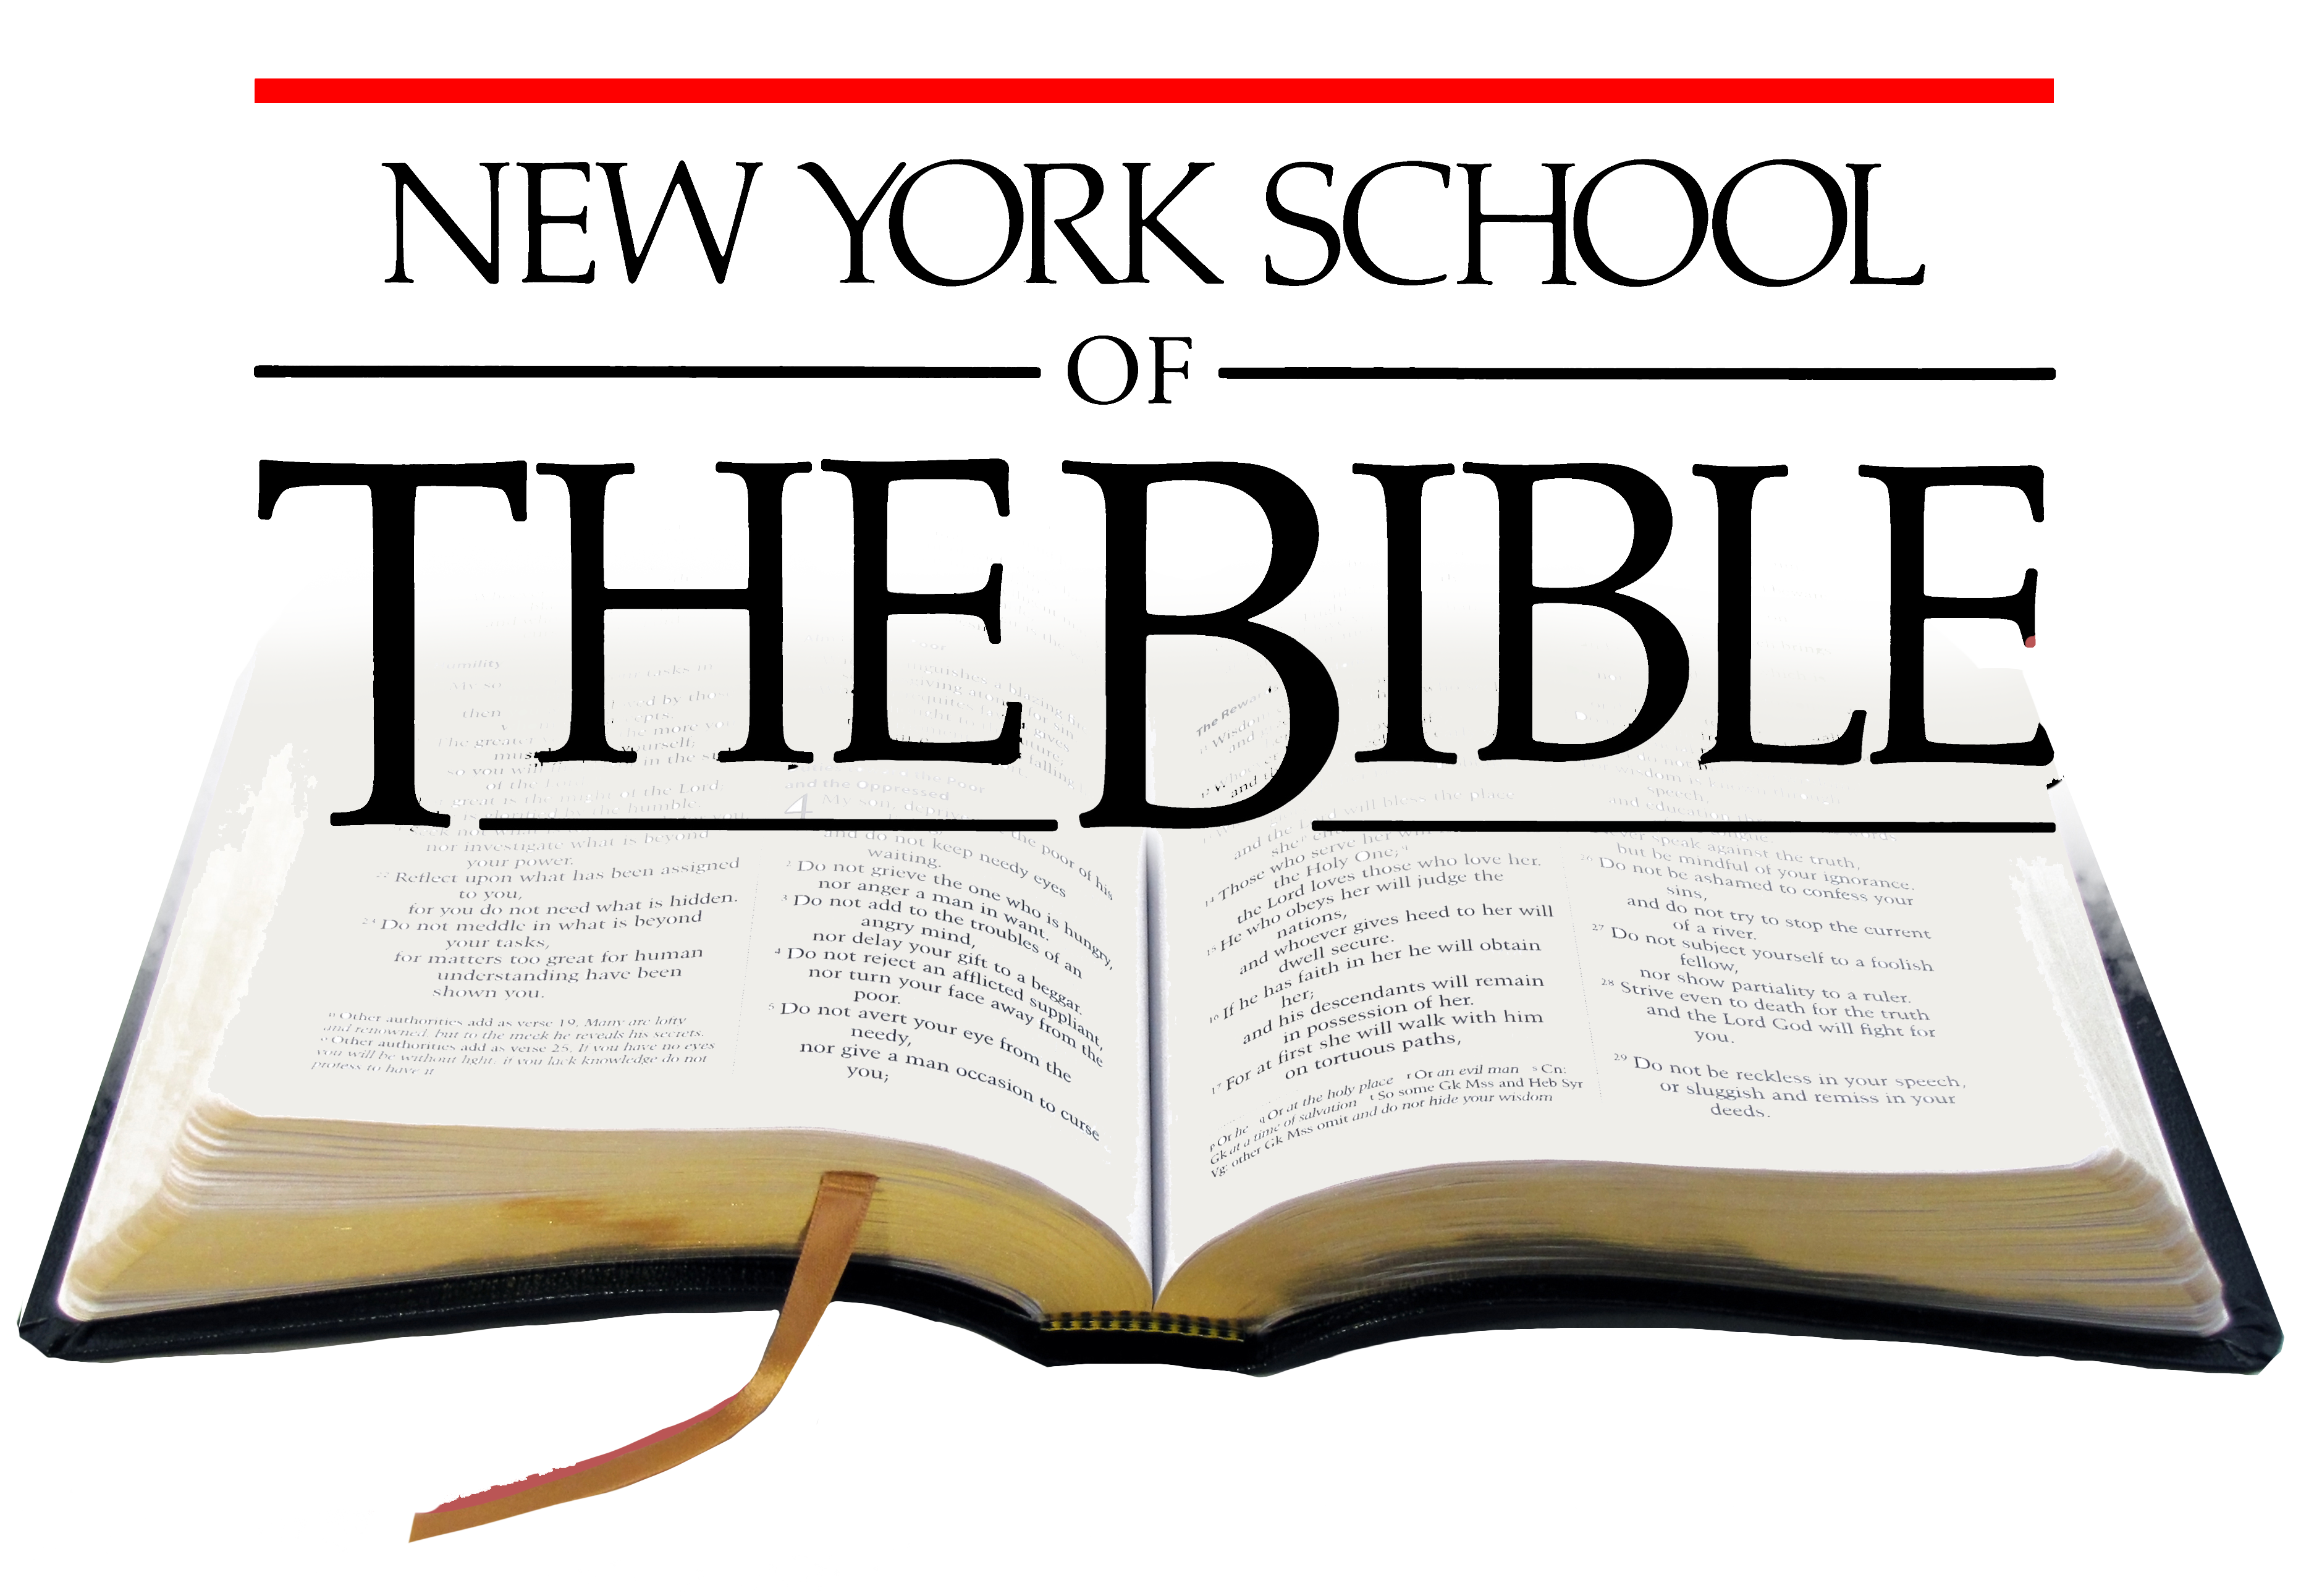 New York School of the Bible